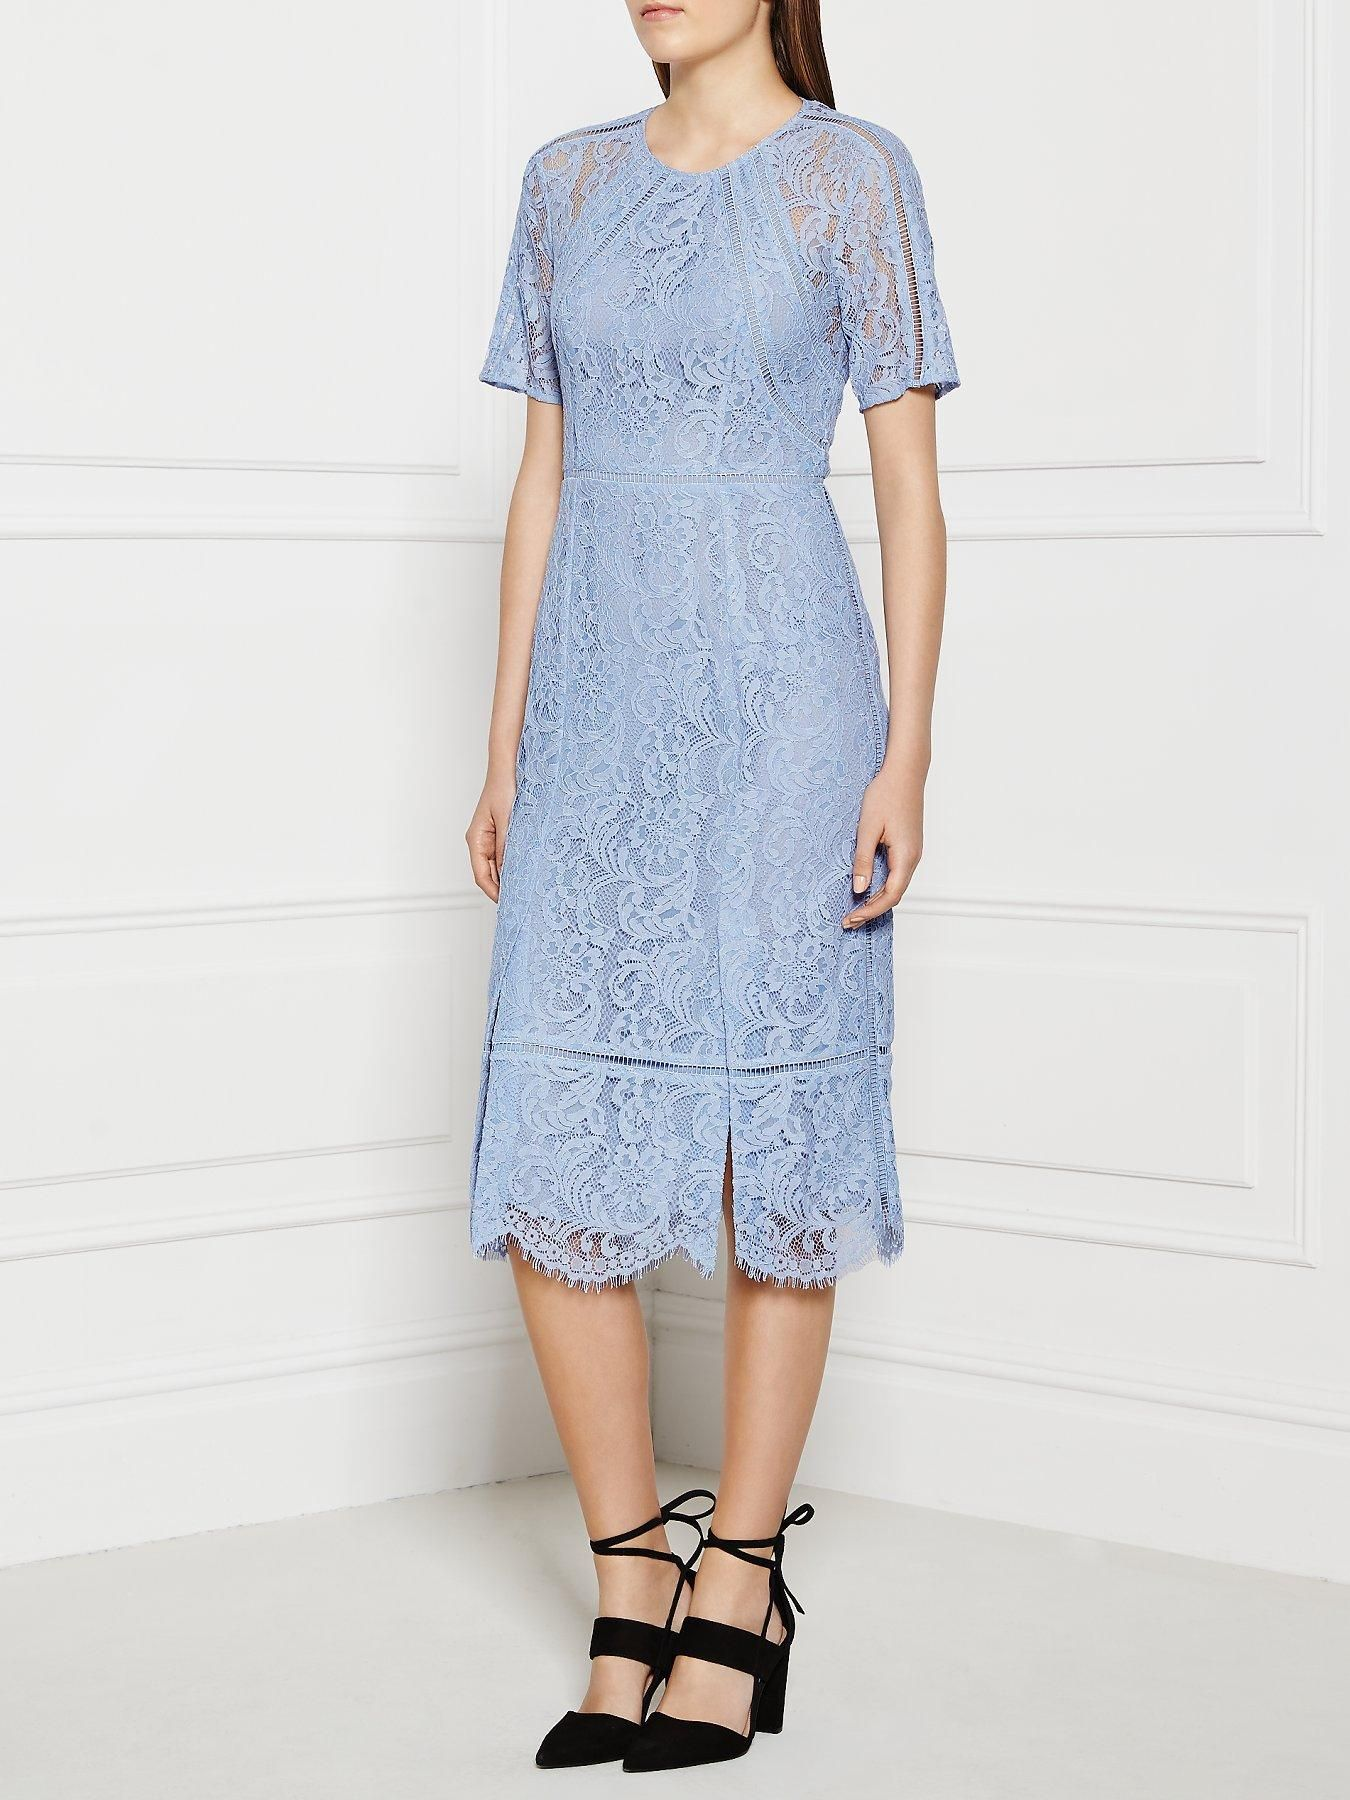 459268c955bd40 Exclusive   www.very.co.uk   Apparel etc   Dresses, Fashion, Blue lacy